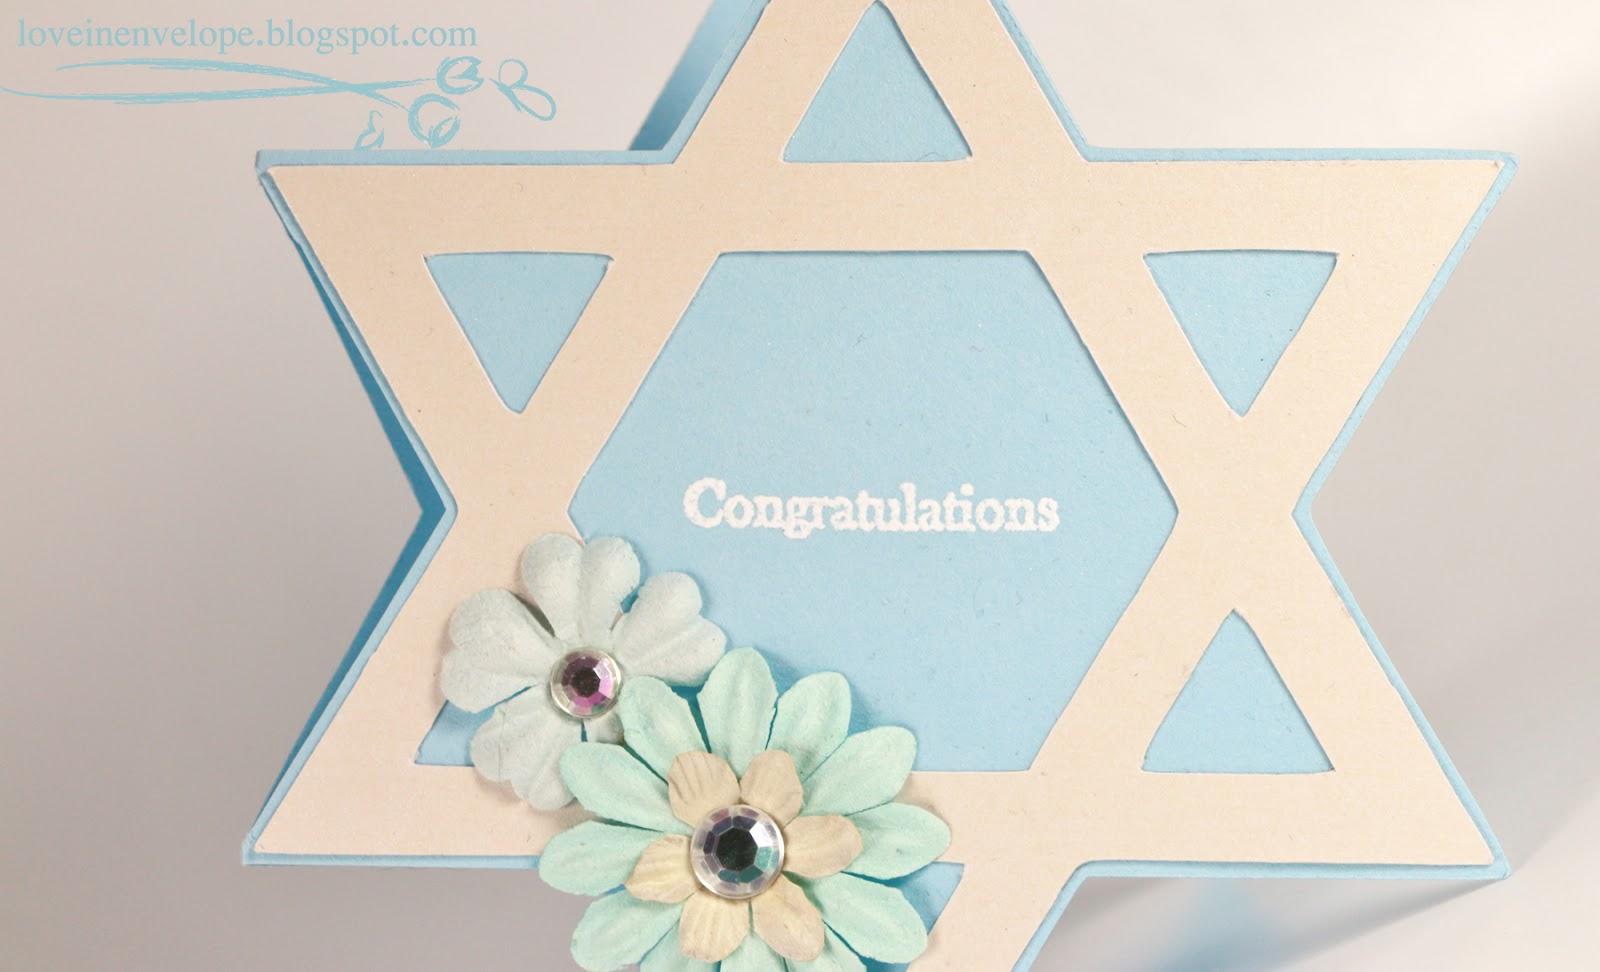 love in envelope star of david shaped bat mitzvah card